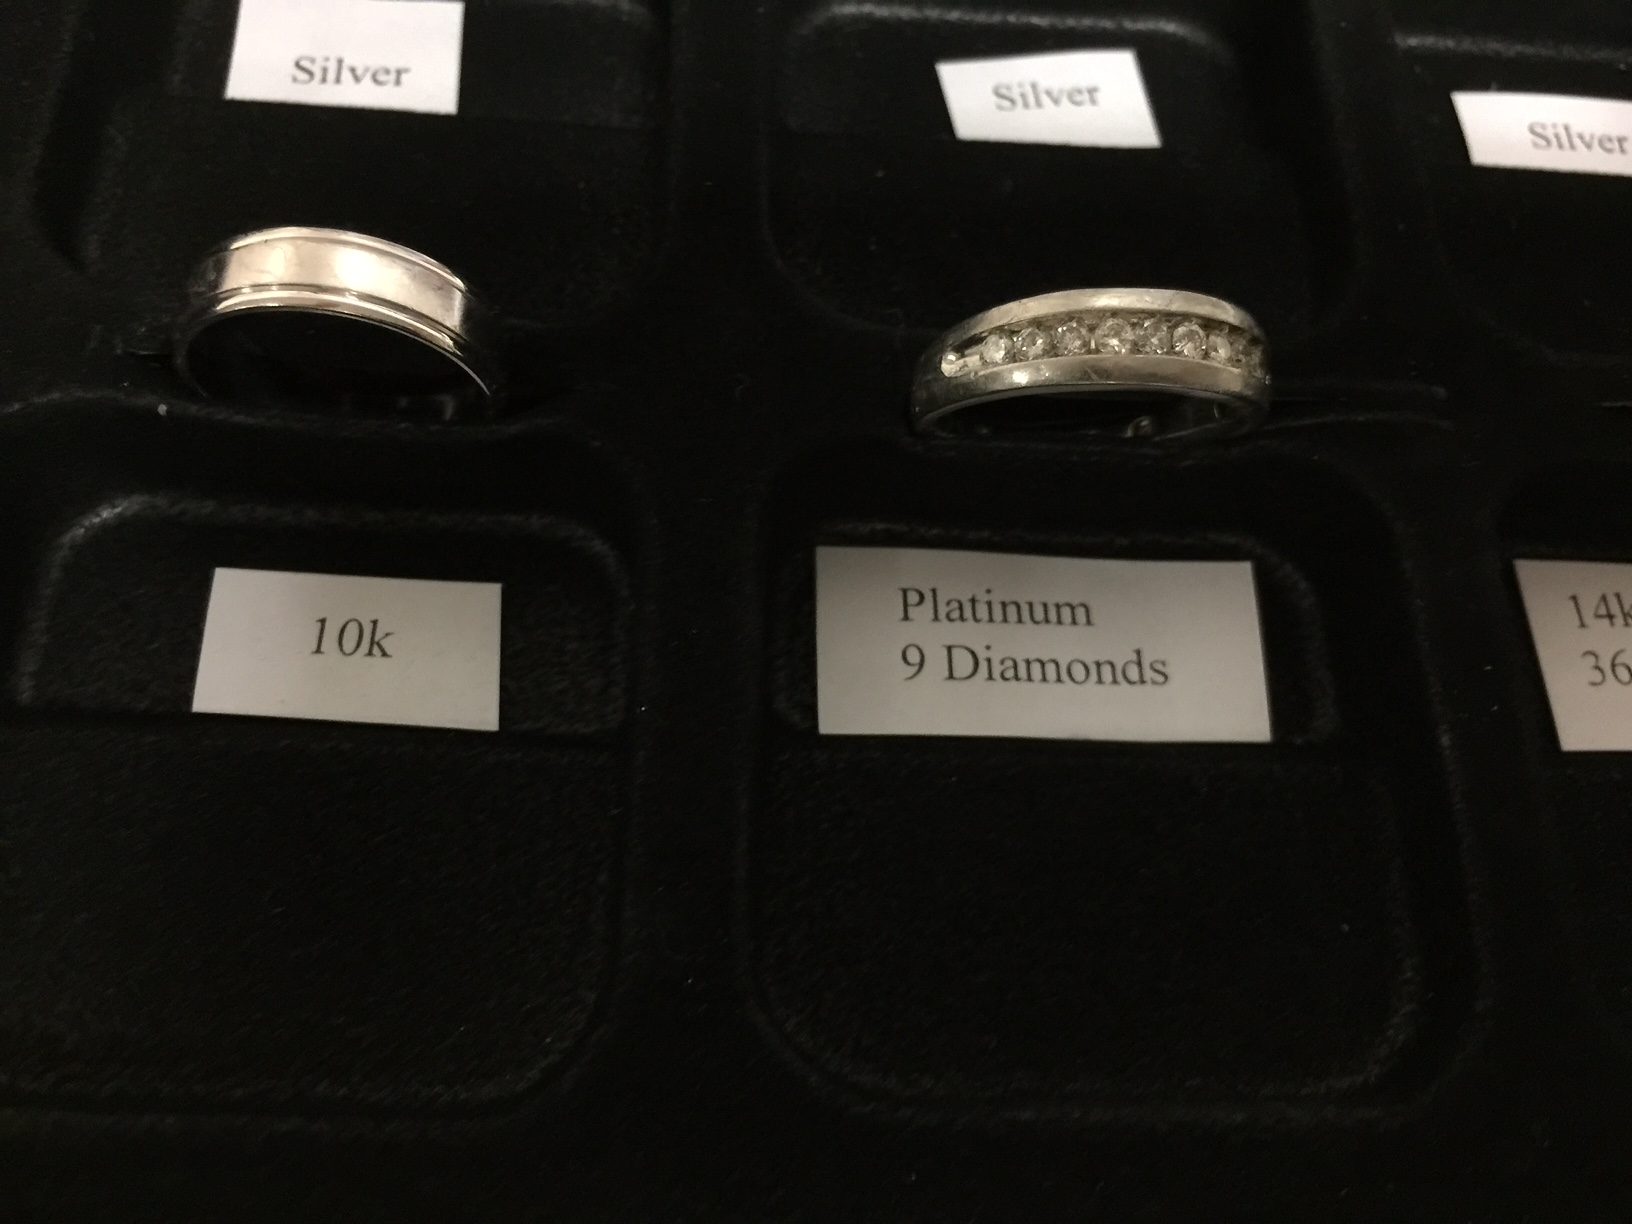 FOTM - Mel Parker - Platinum Ring with 9 Diamonds